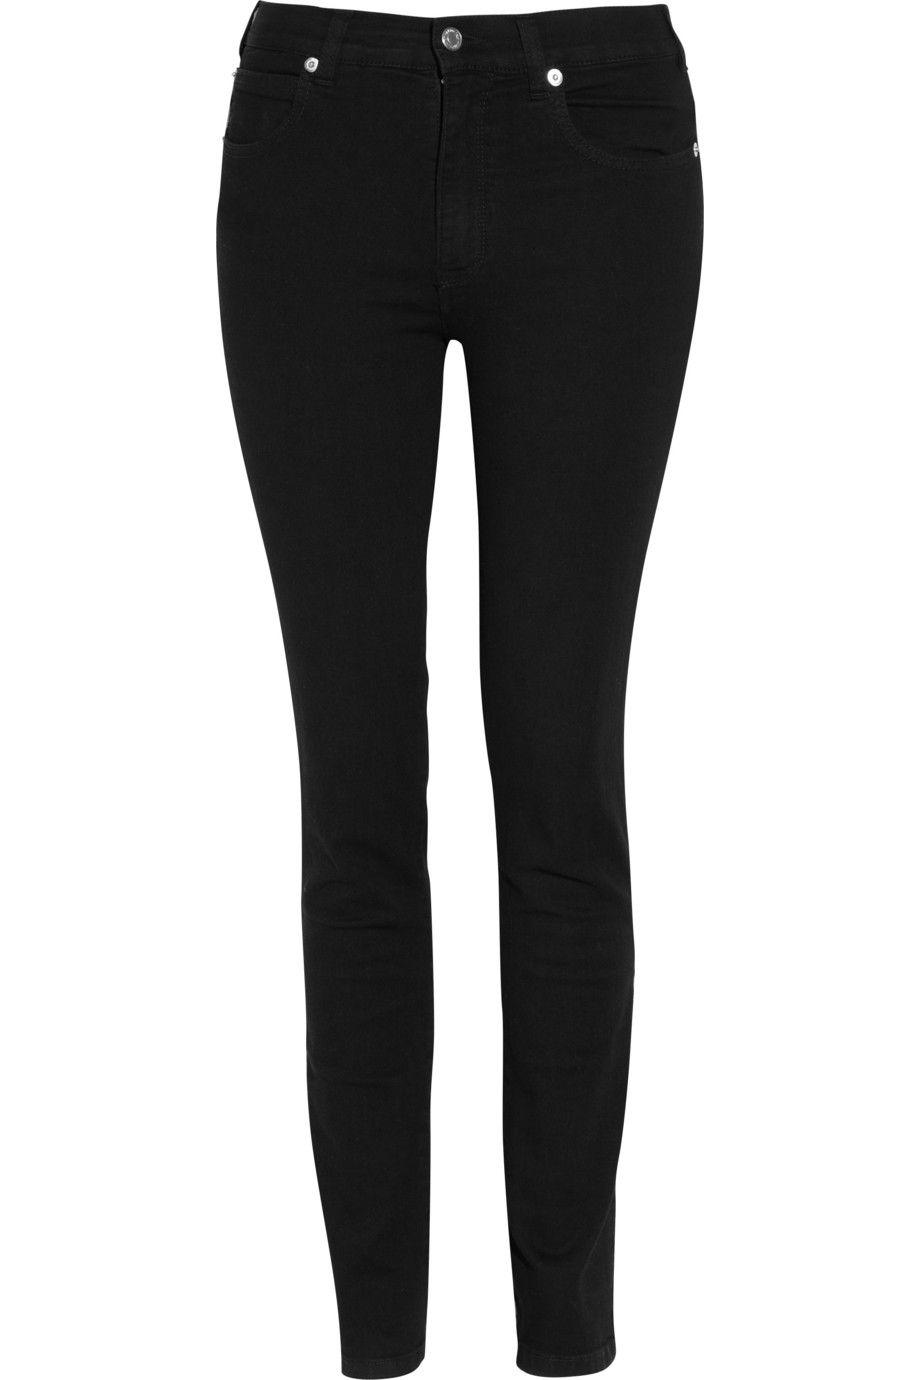 KATHARINE HAMNETT  Amy low-rise skinny jeans  $180